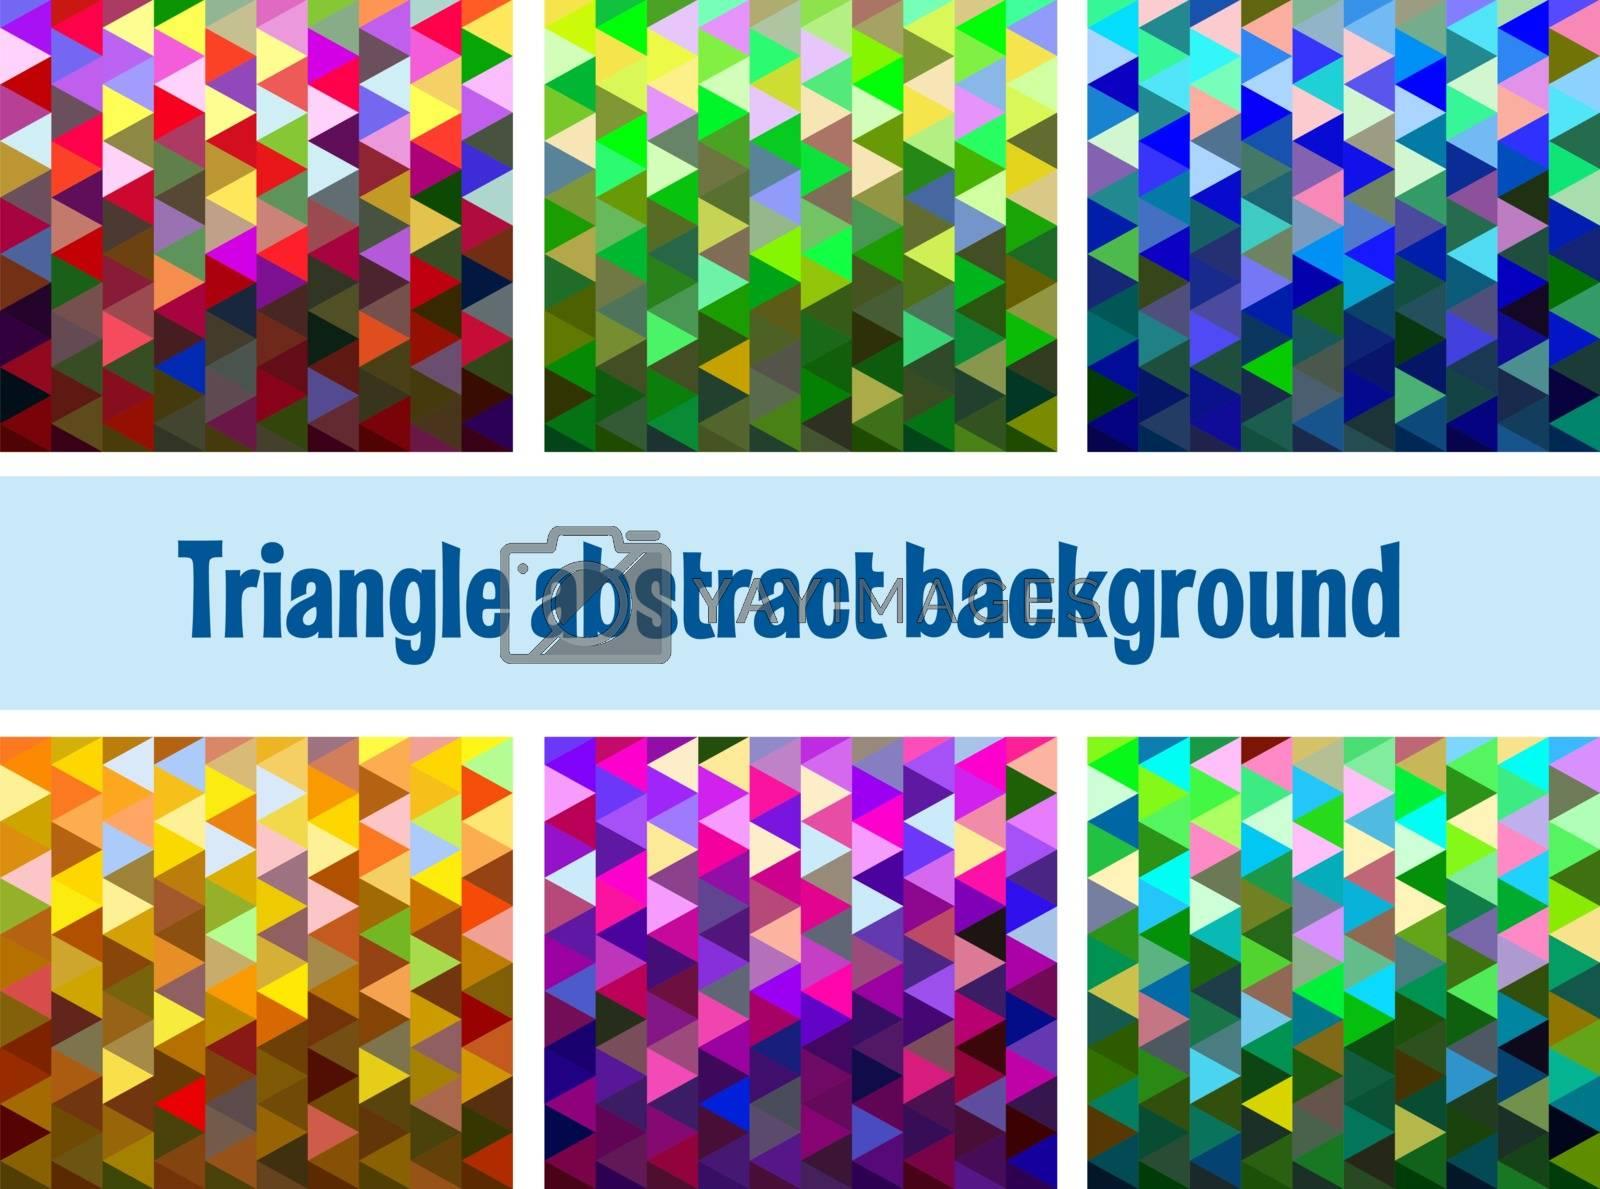 Multicolor triangular mesh mosaic background, creative design templates